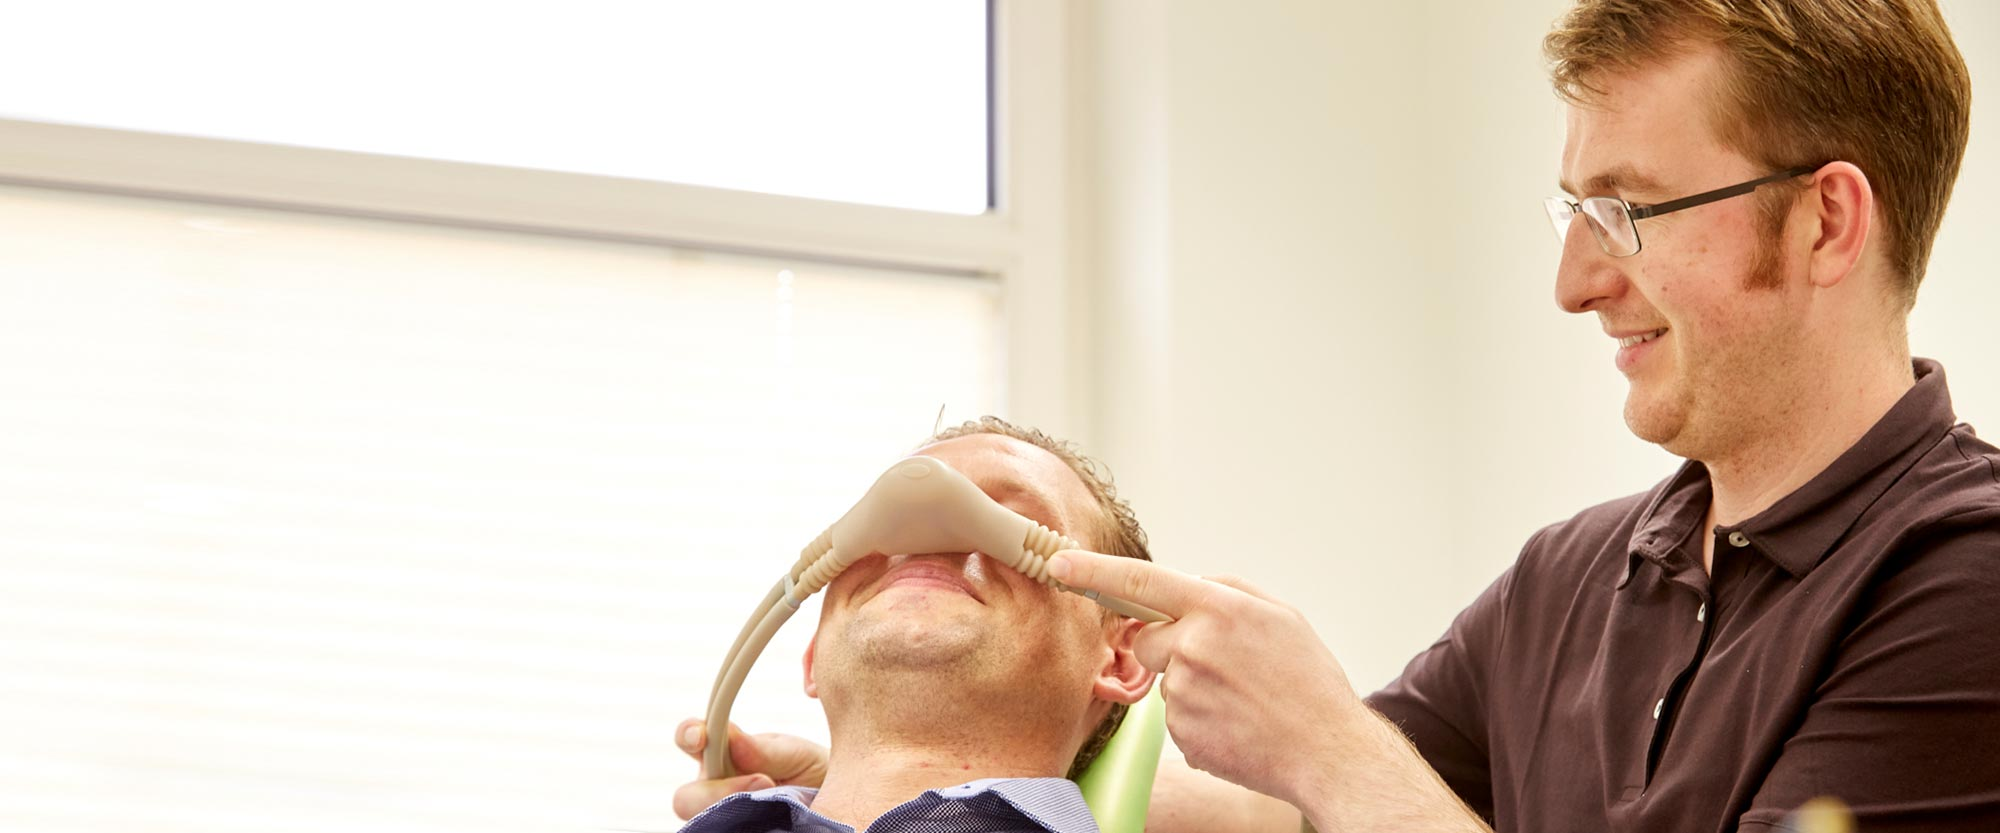 Zahnarzt Lennard Bertram bietet eine schonende Behandlung für Angstpatienten